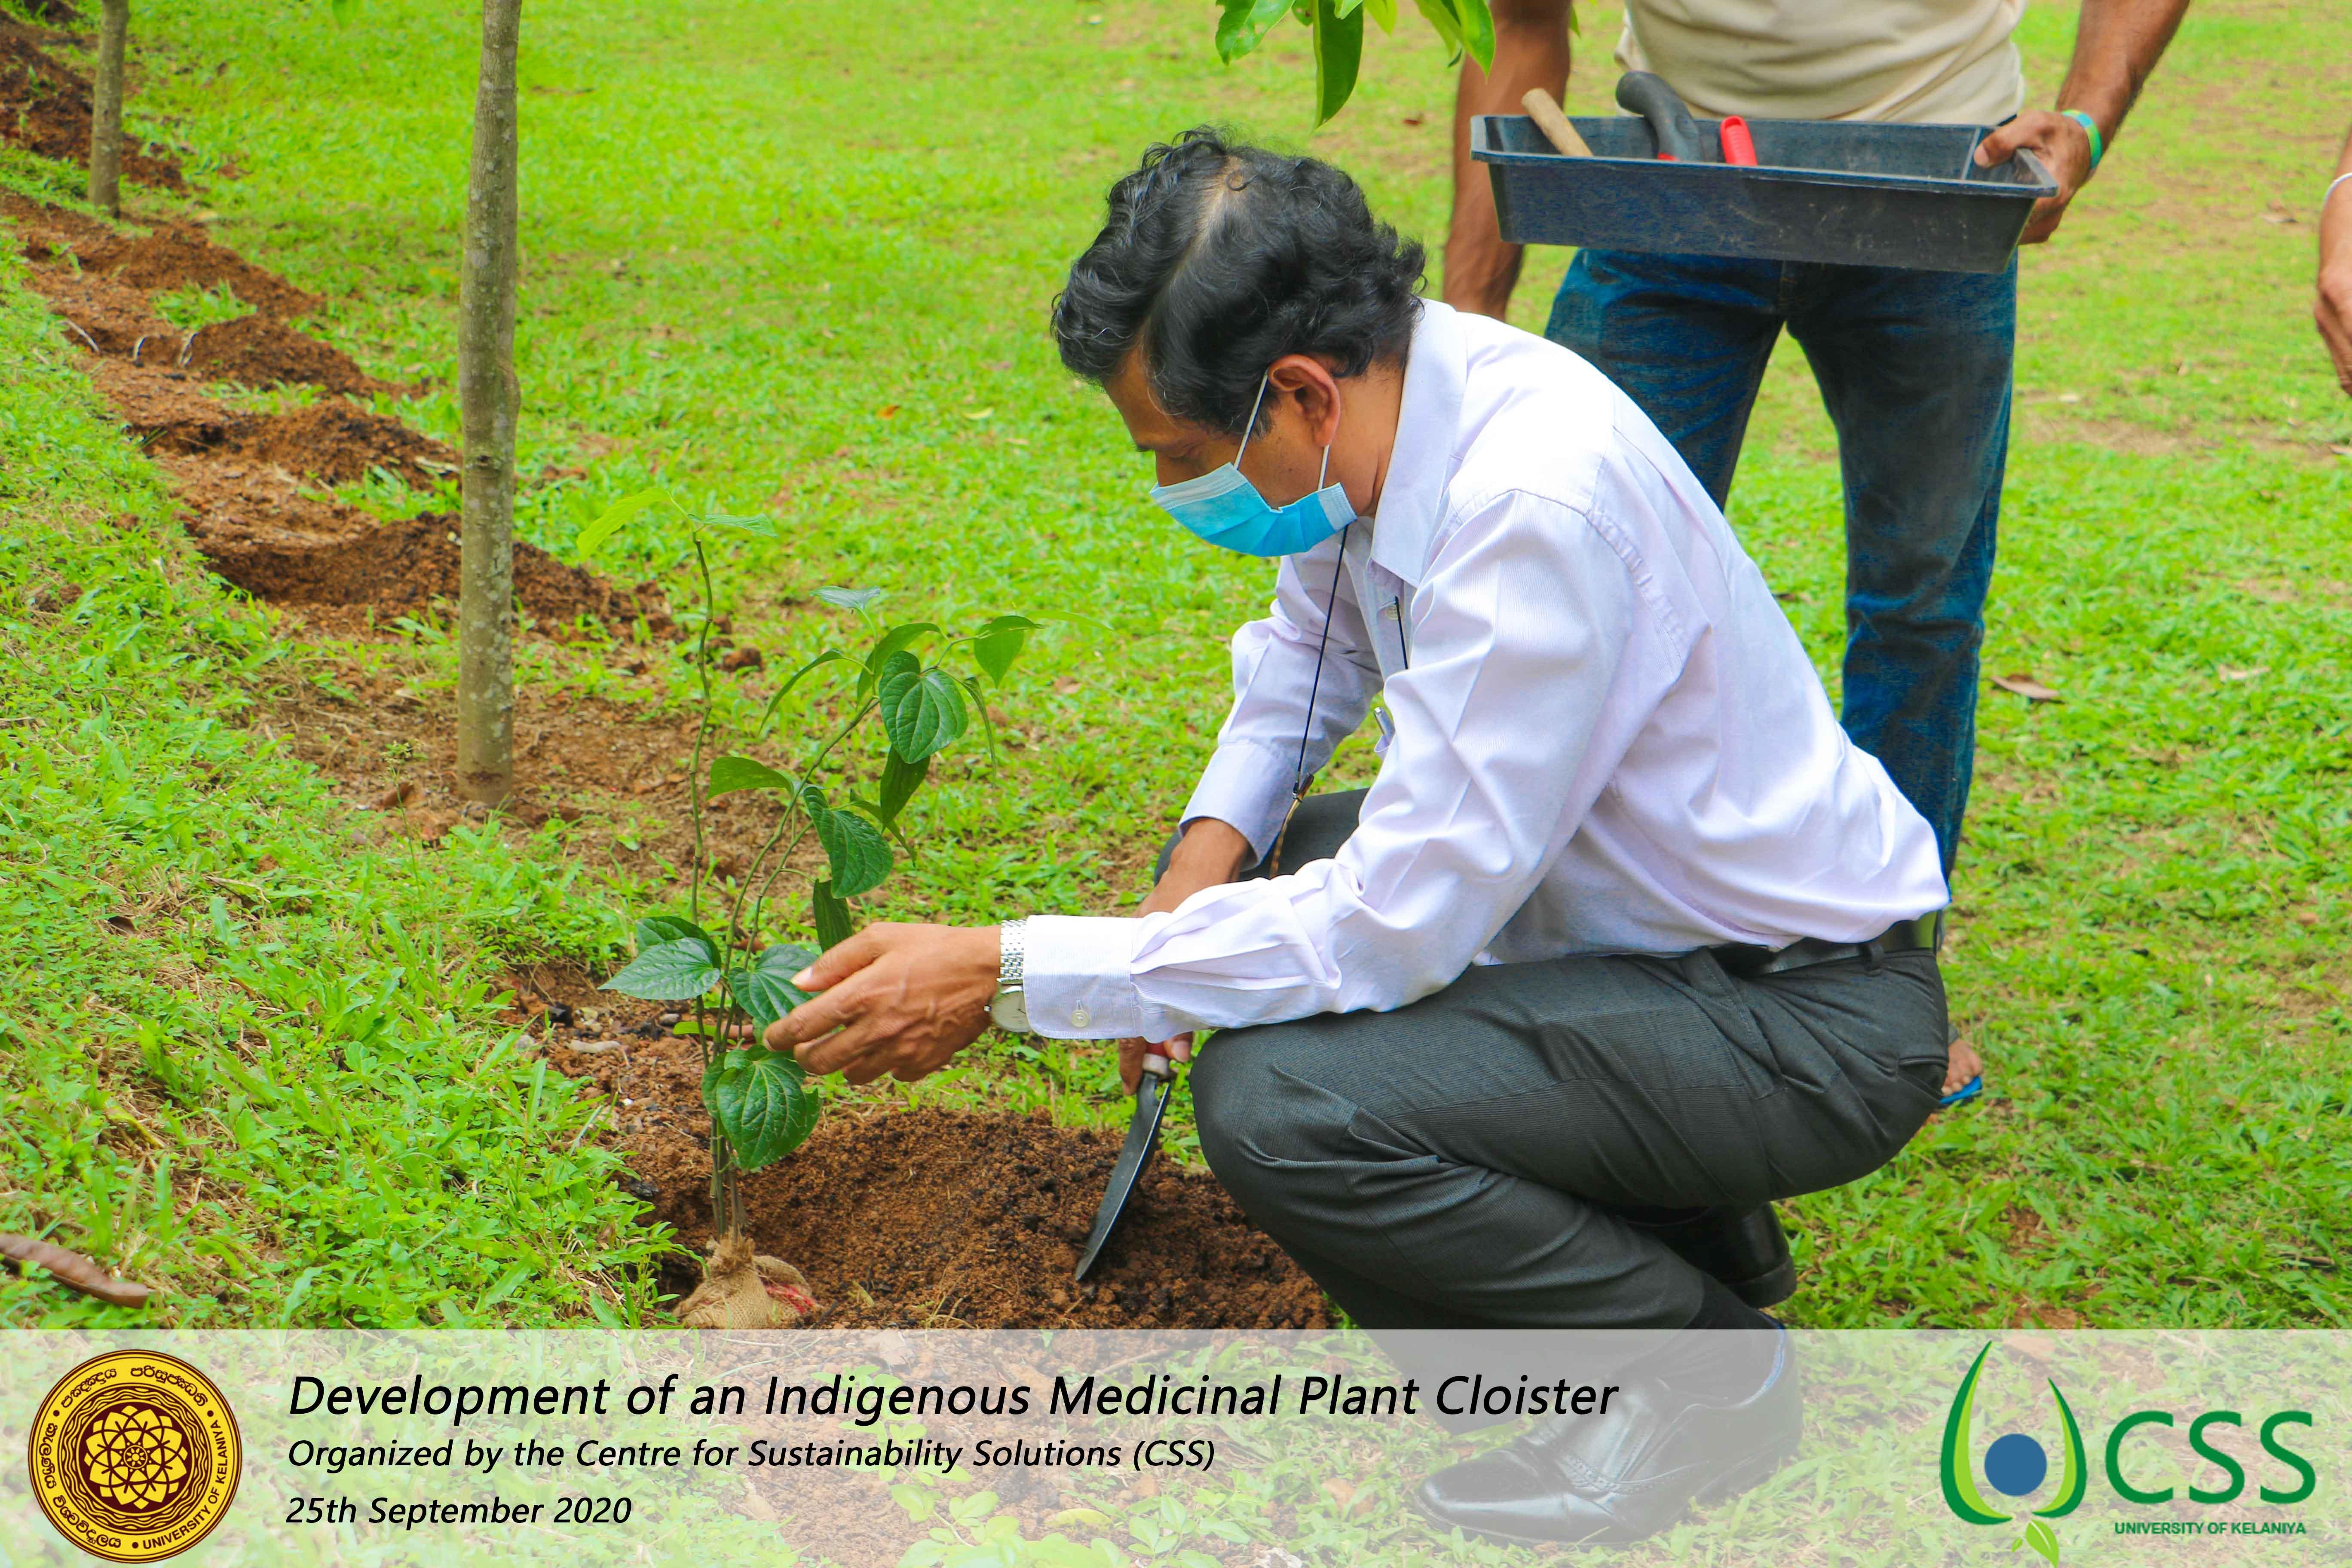 Development of A Medicinal Plant Cloister in University of Kelaniya